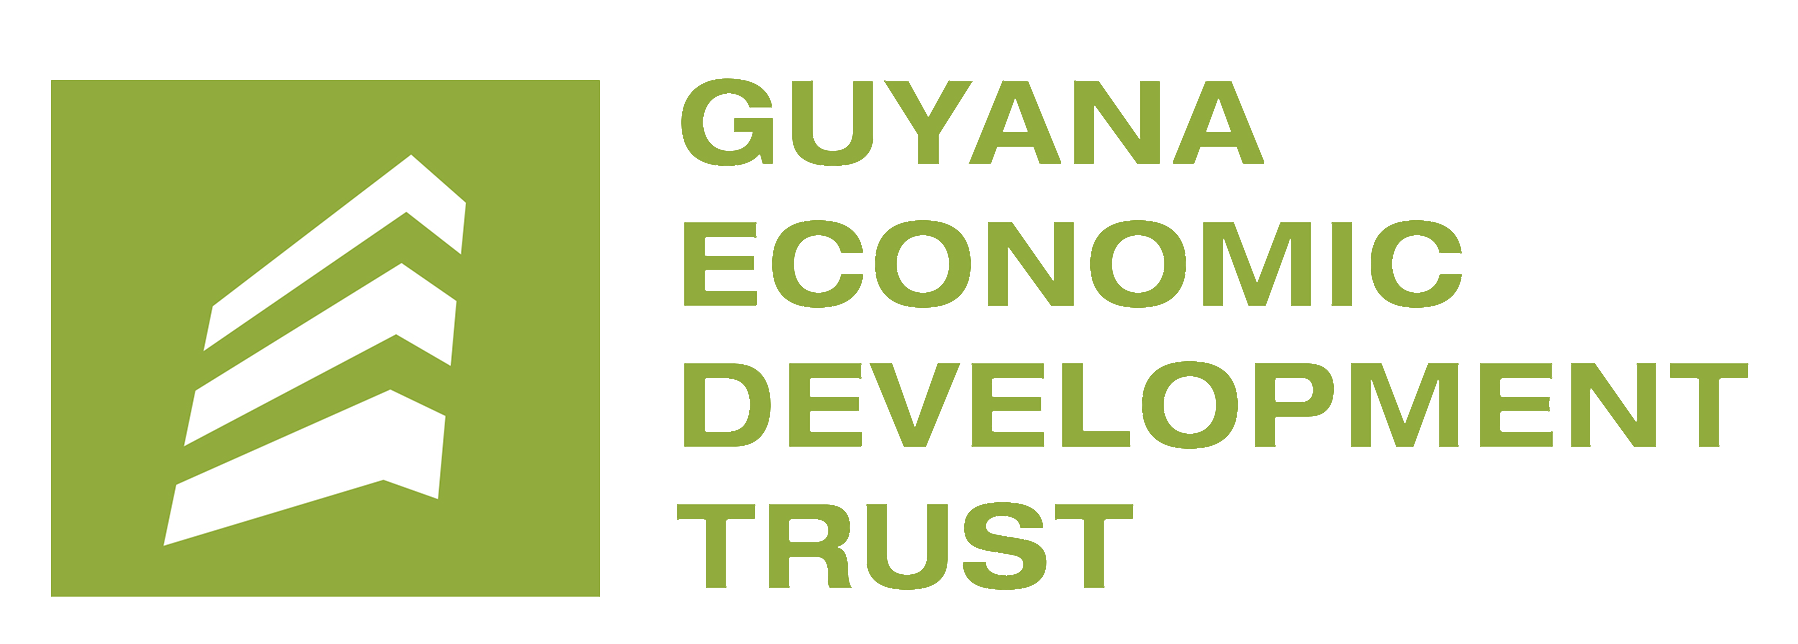 Guyana Economic Development Trust